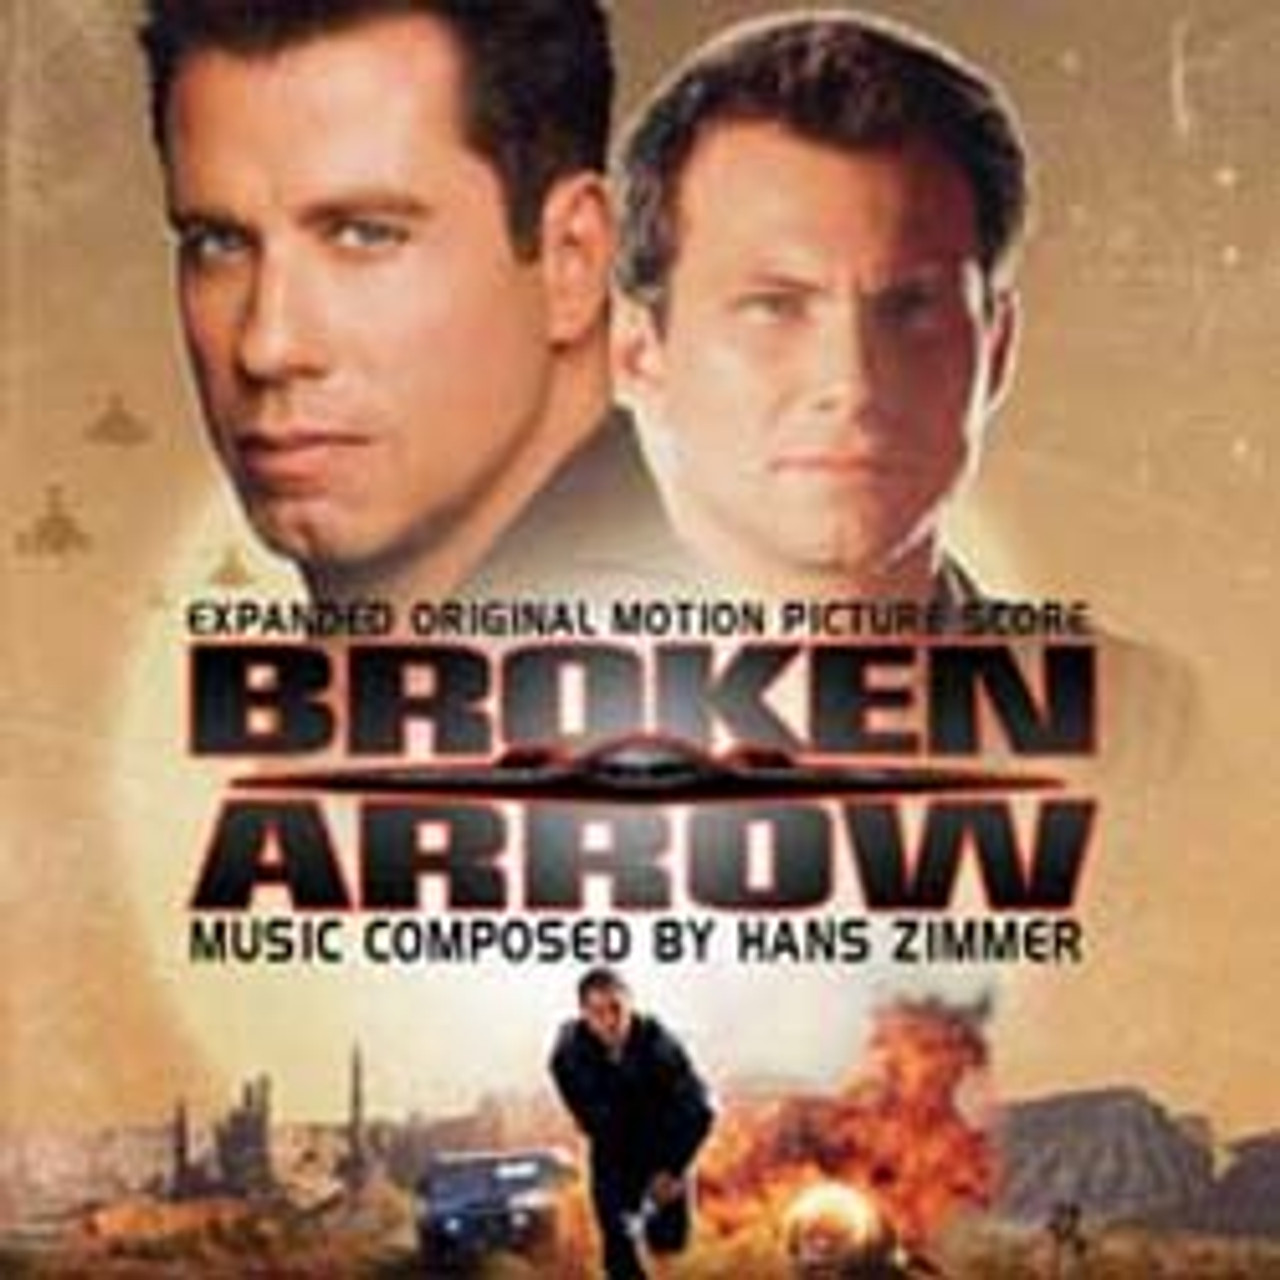 BROKEN ARROW: LIMITED EDITION (2CD-SET)